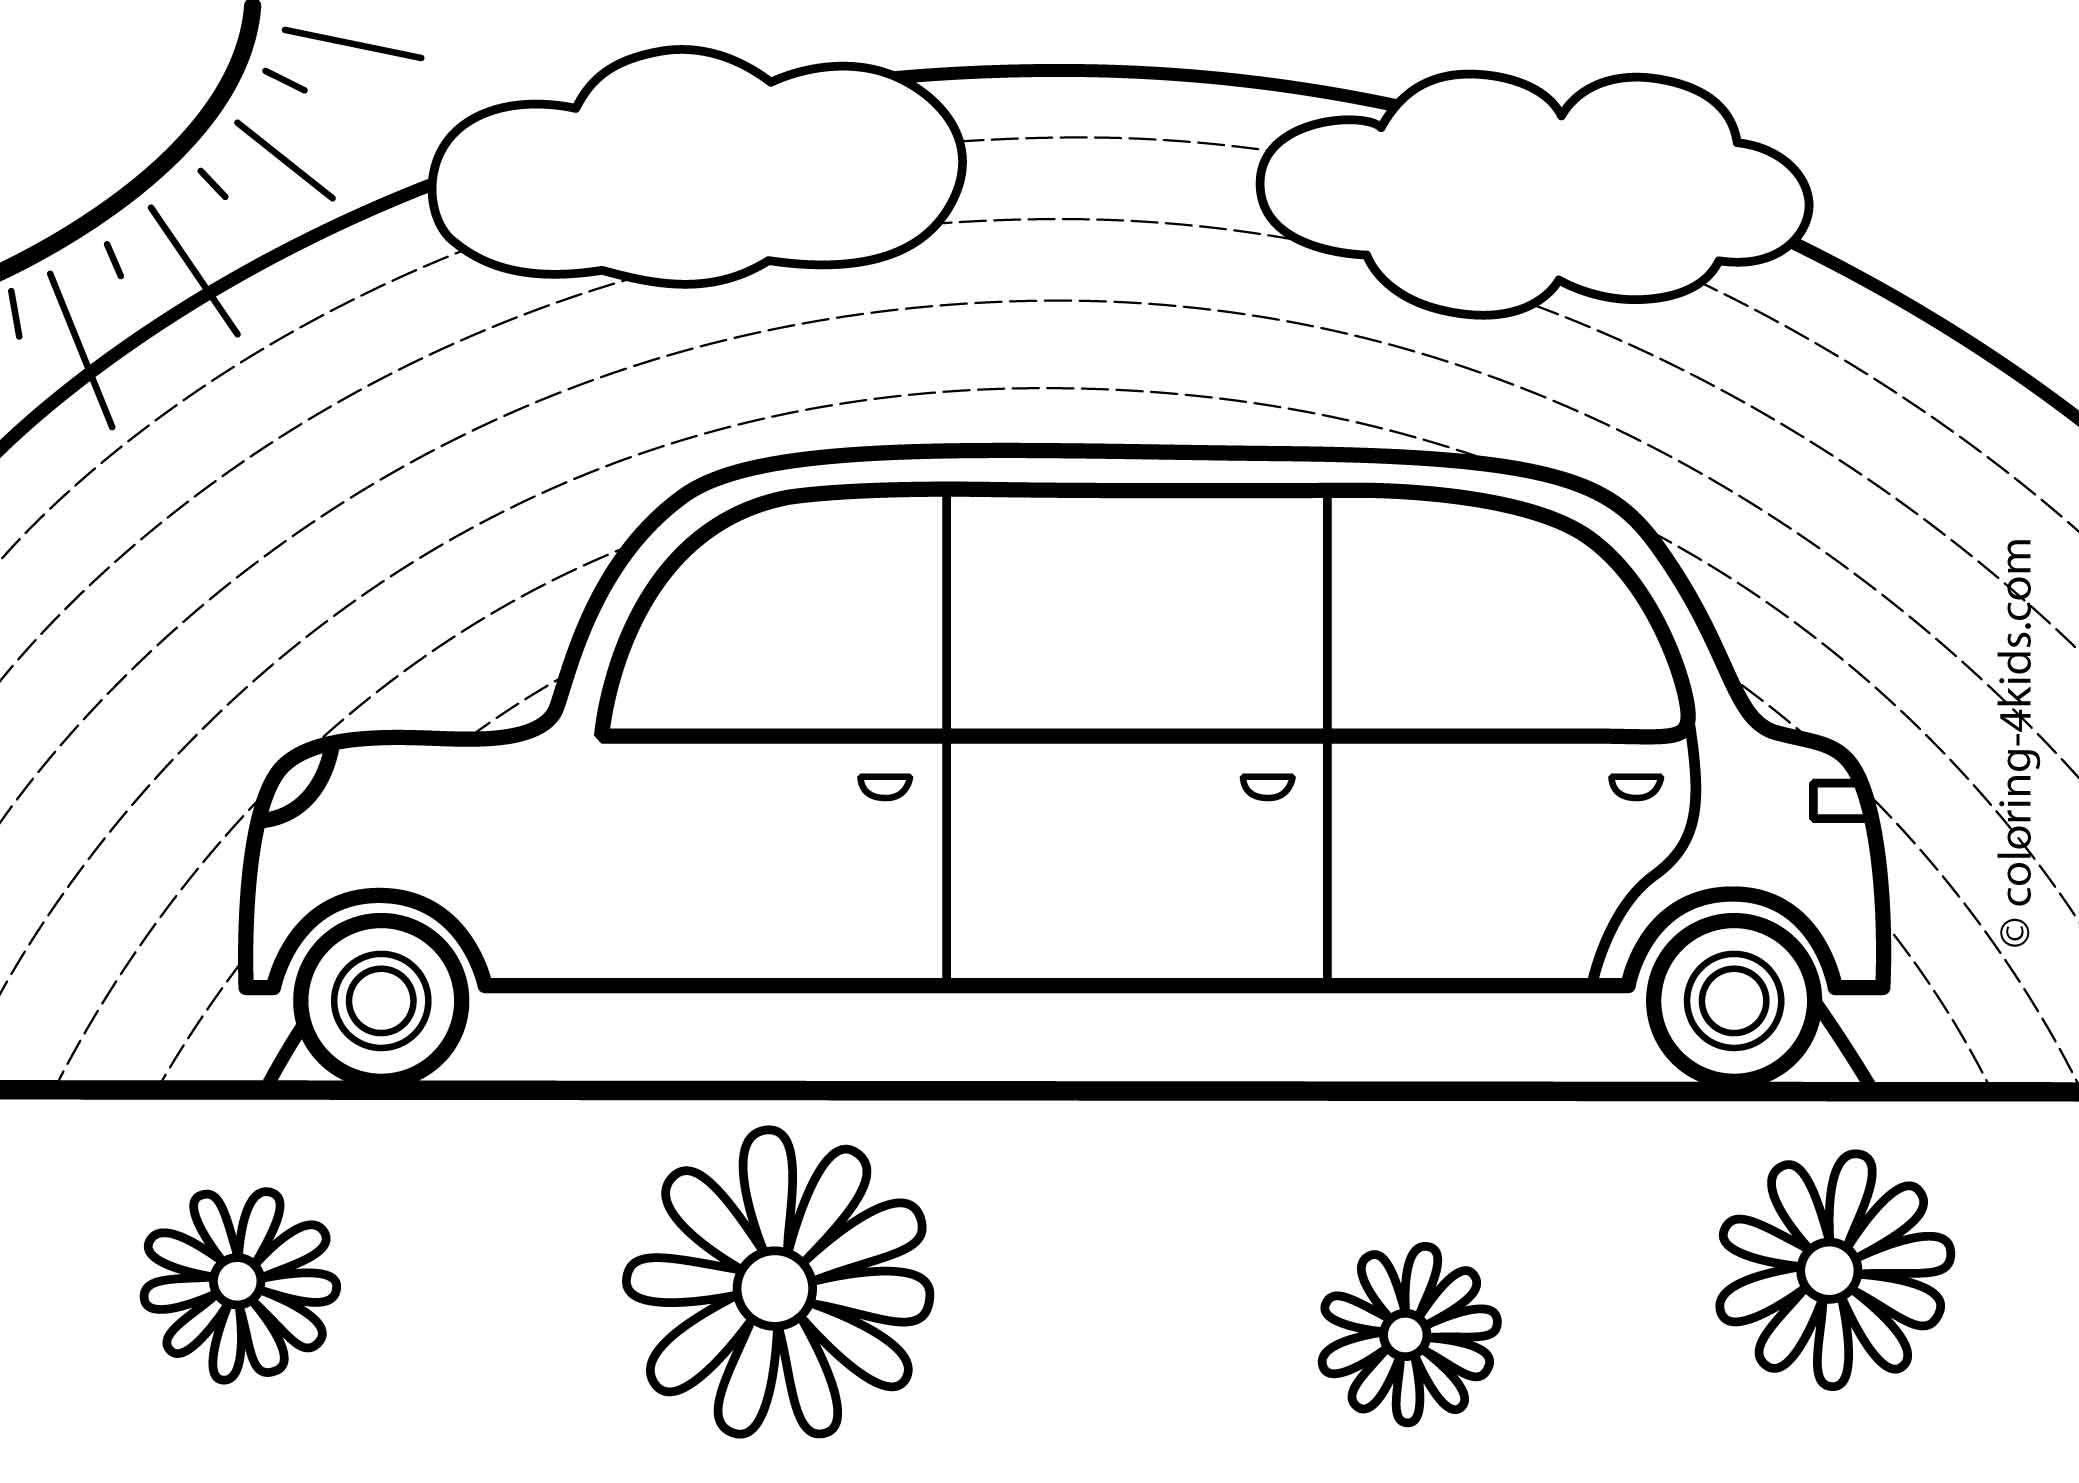 Off Road Vehicle Worksheet Education Com Coloring Pages Kindergarten Coloring Pages Offroad Vehicles